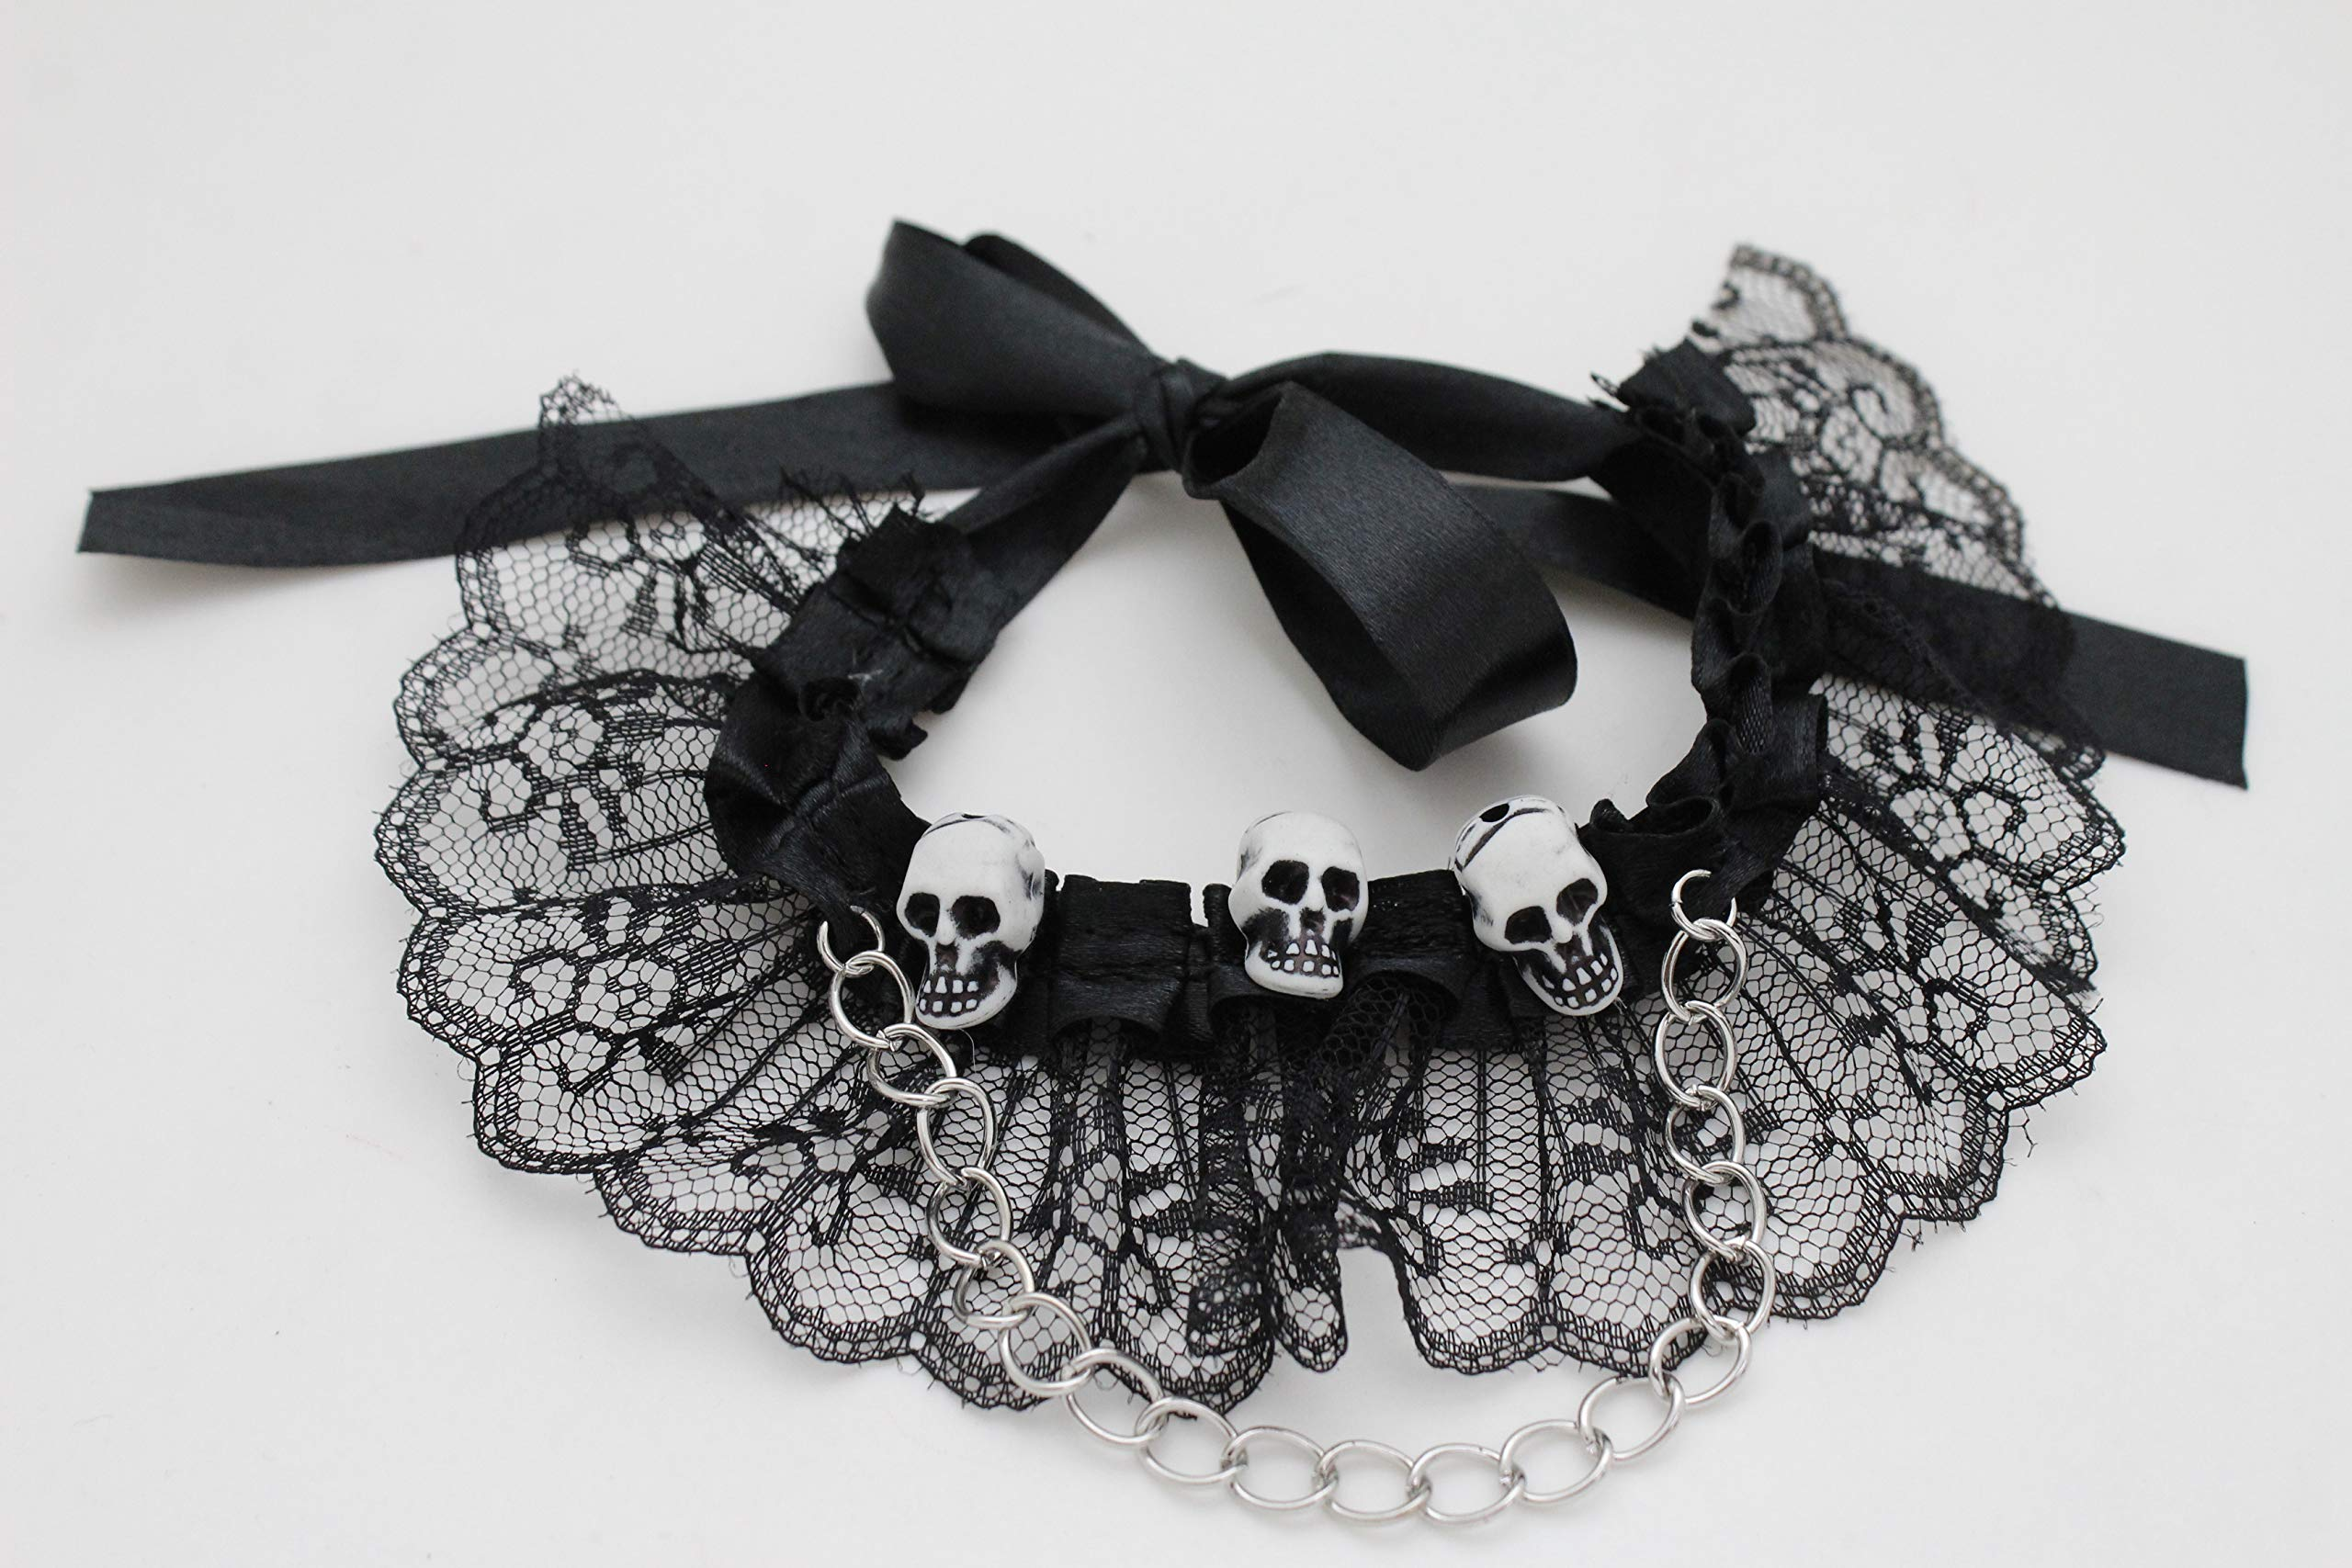 TFJ Women Black Lace Tie Band Boot Chain Bracelet Silver Metal Skeleton Skull Shoe Charms